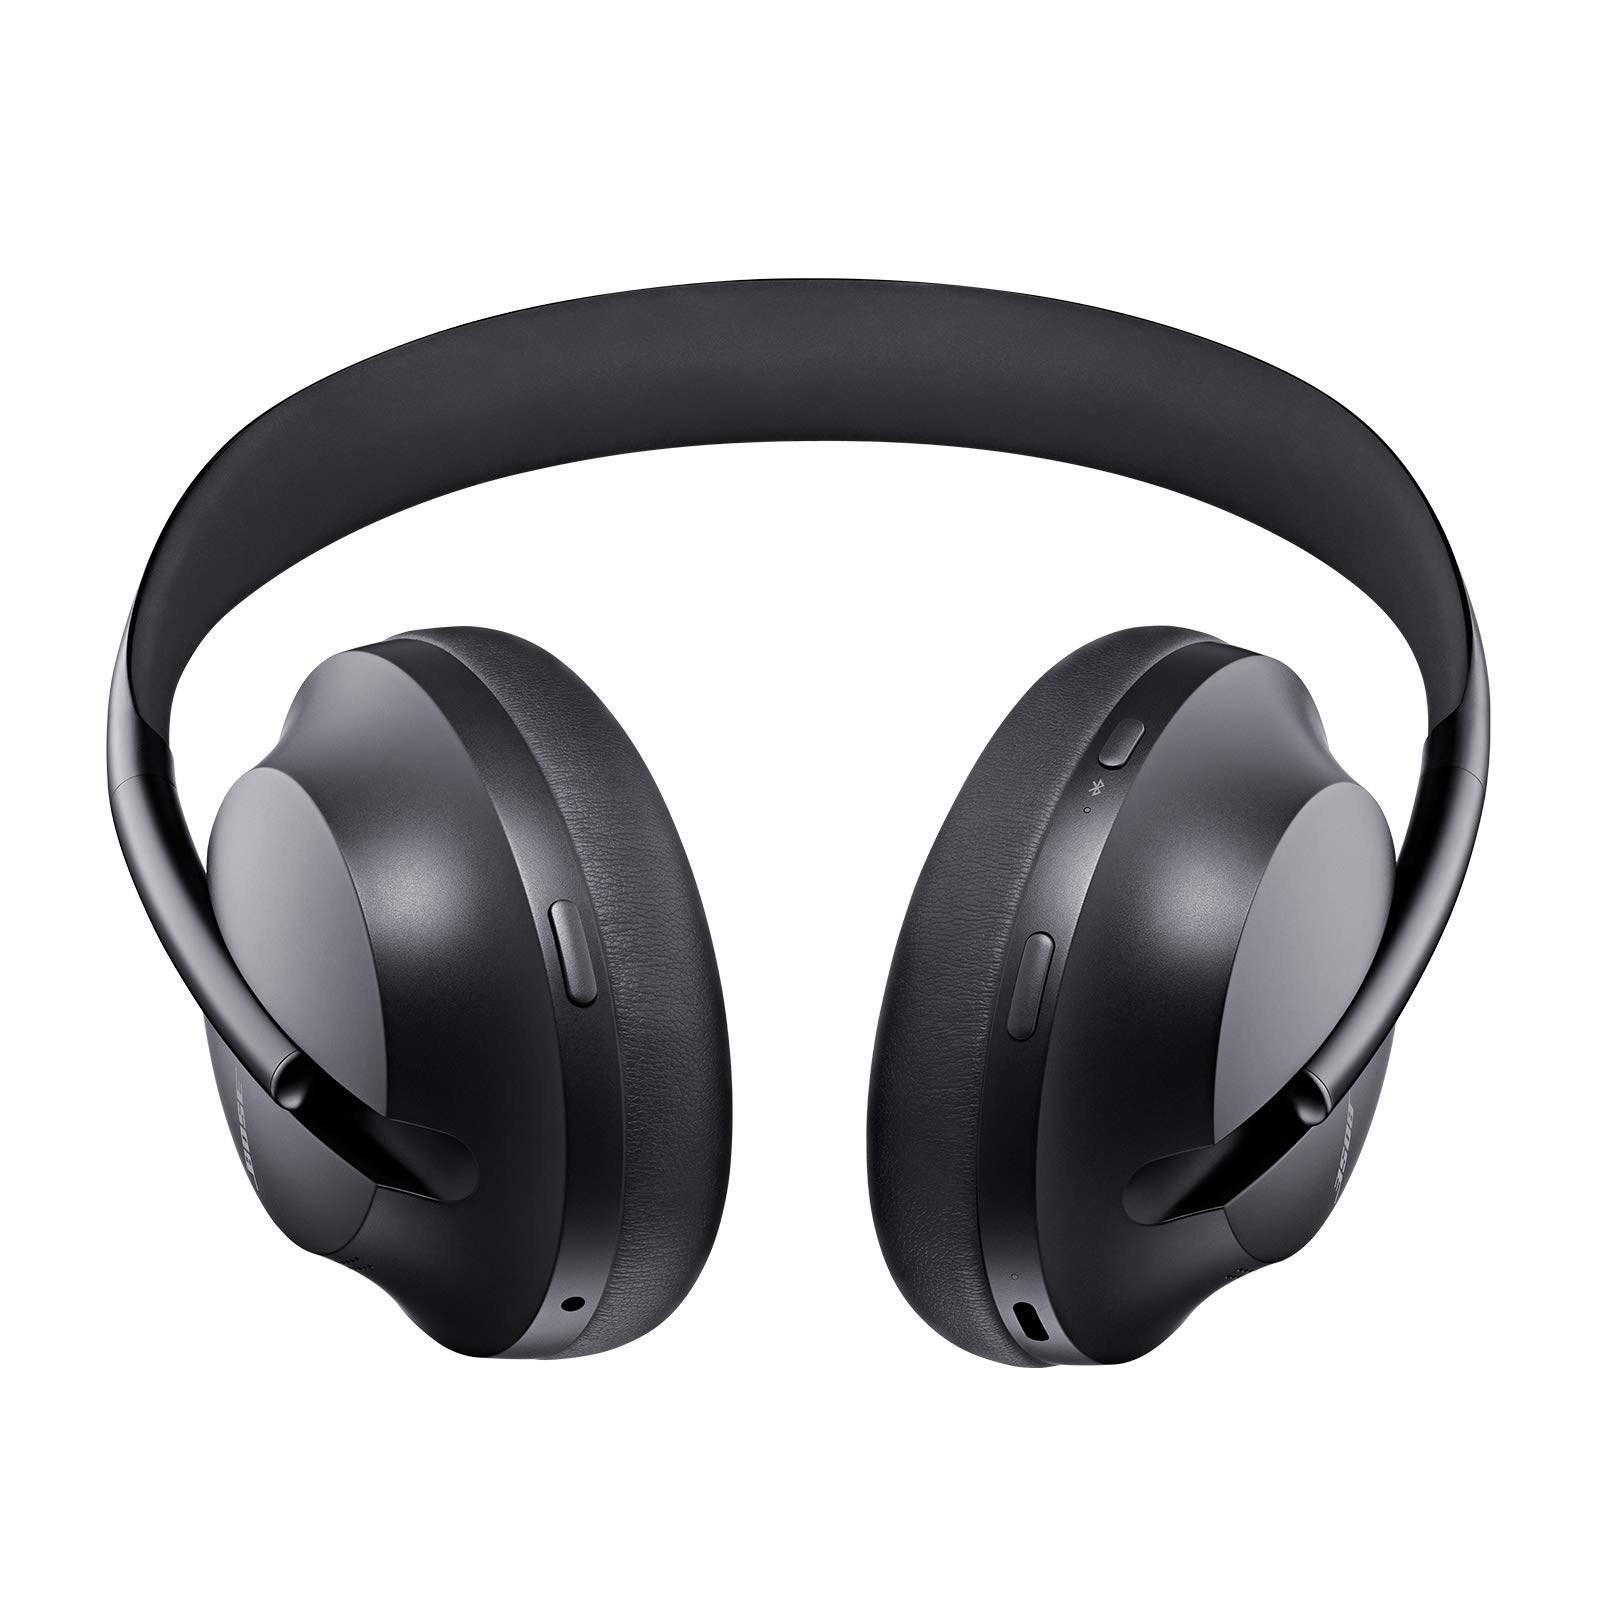 Bose nc700 보스 블루투스 헤드폰 블루투스헤드폰, 블랙